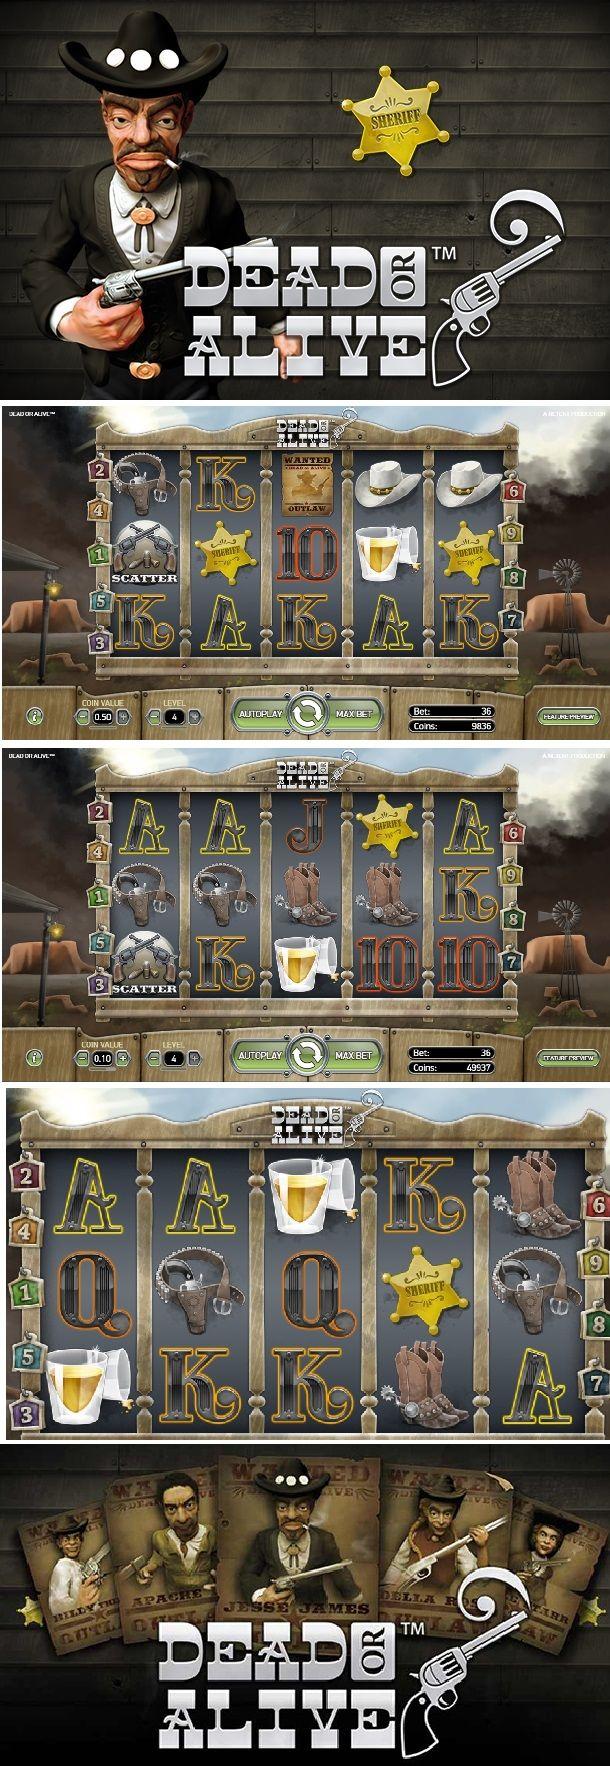 Best video game gambling sites camio casino